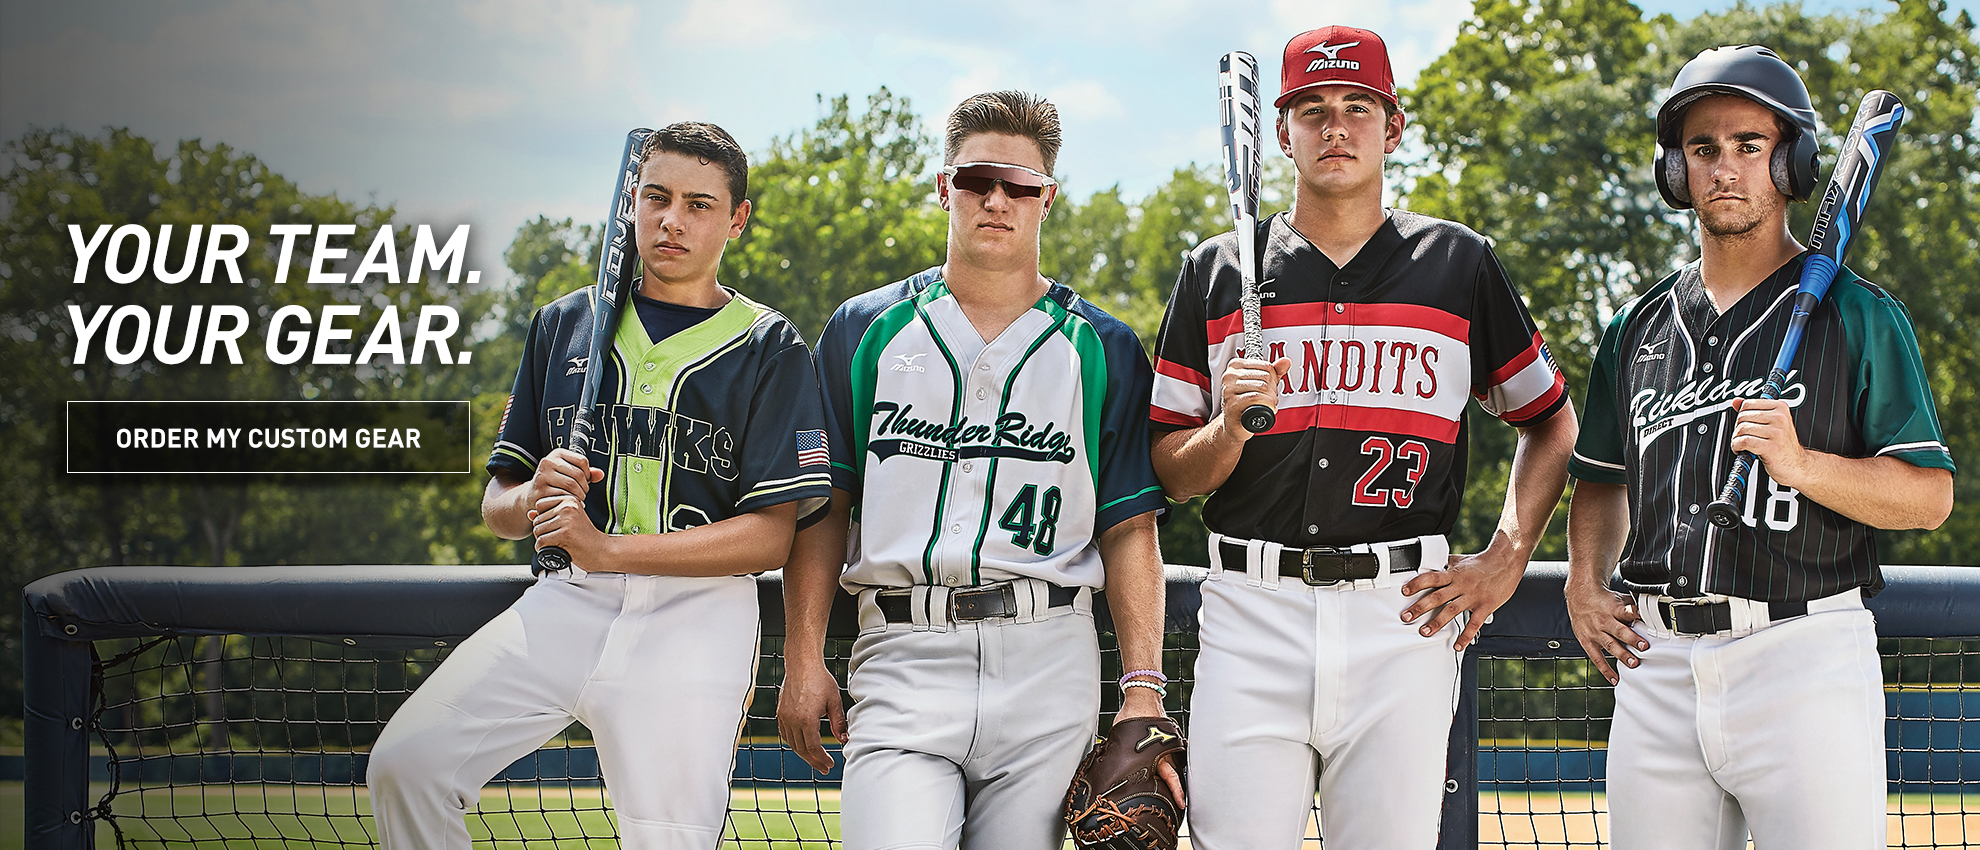 Mizuno Baseball Team, Team Gear, Team Baseball Gear, Mizuno Baseball Gear, Mizuno Gear Sales